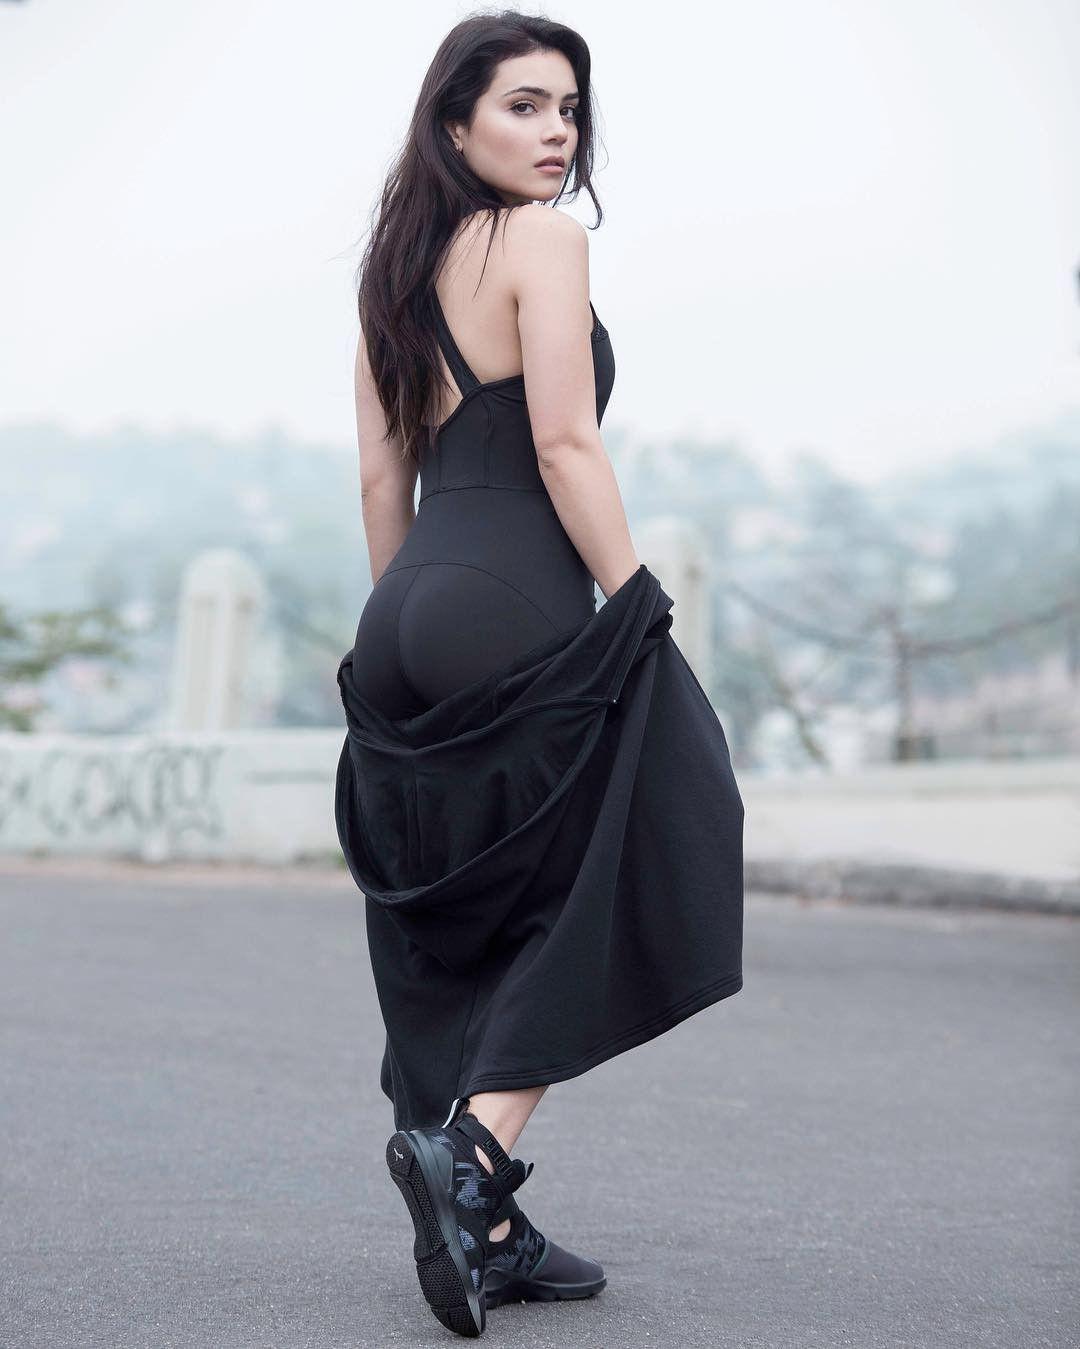 c5a0deac4f89 Andrea Londo | Andrea Londo in 2019 | Beauty, Emilia clarke, Olivia munn